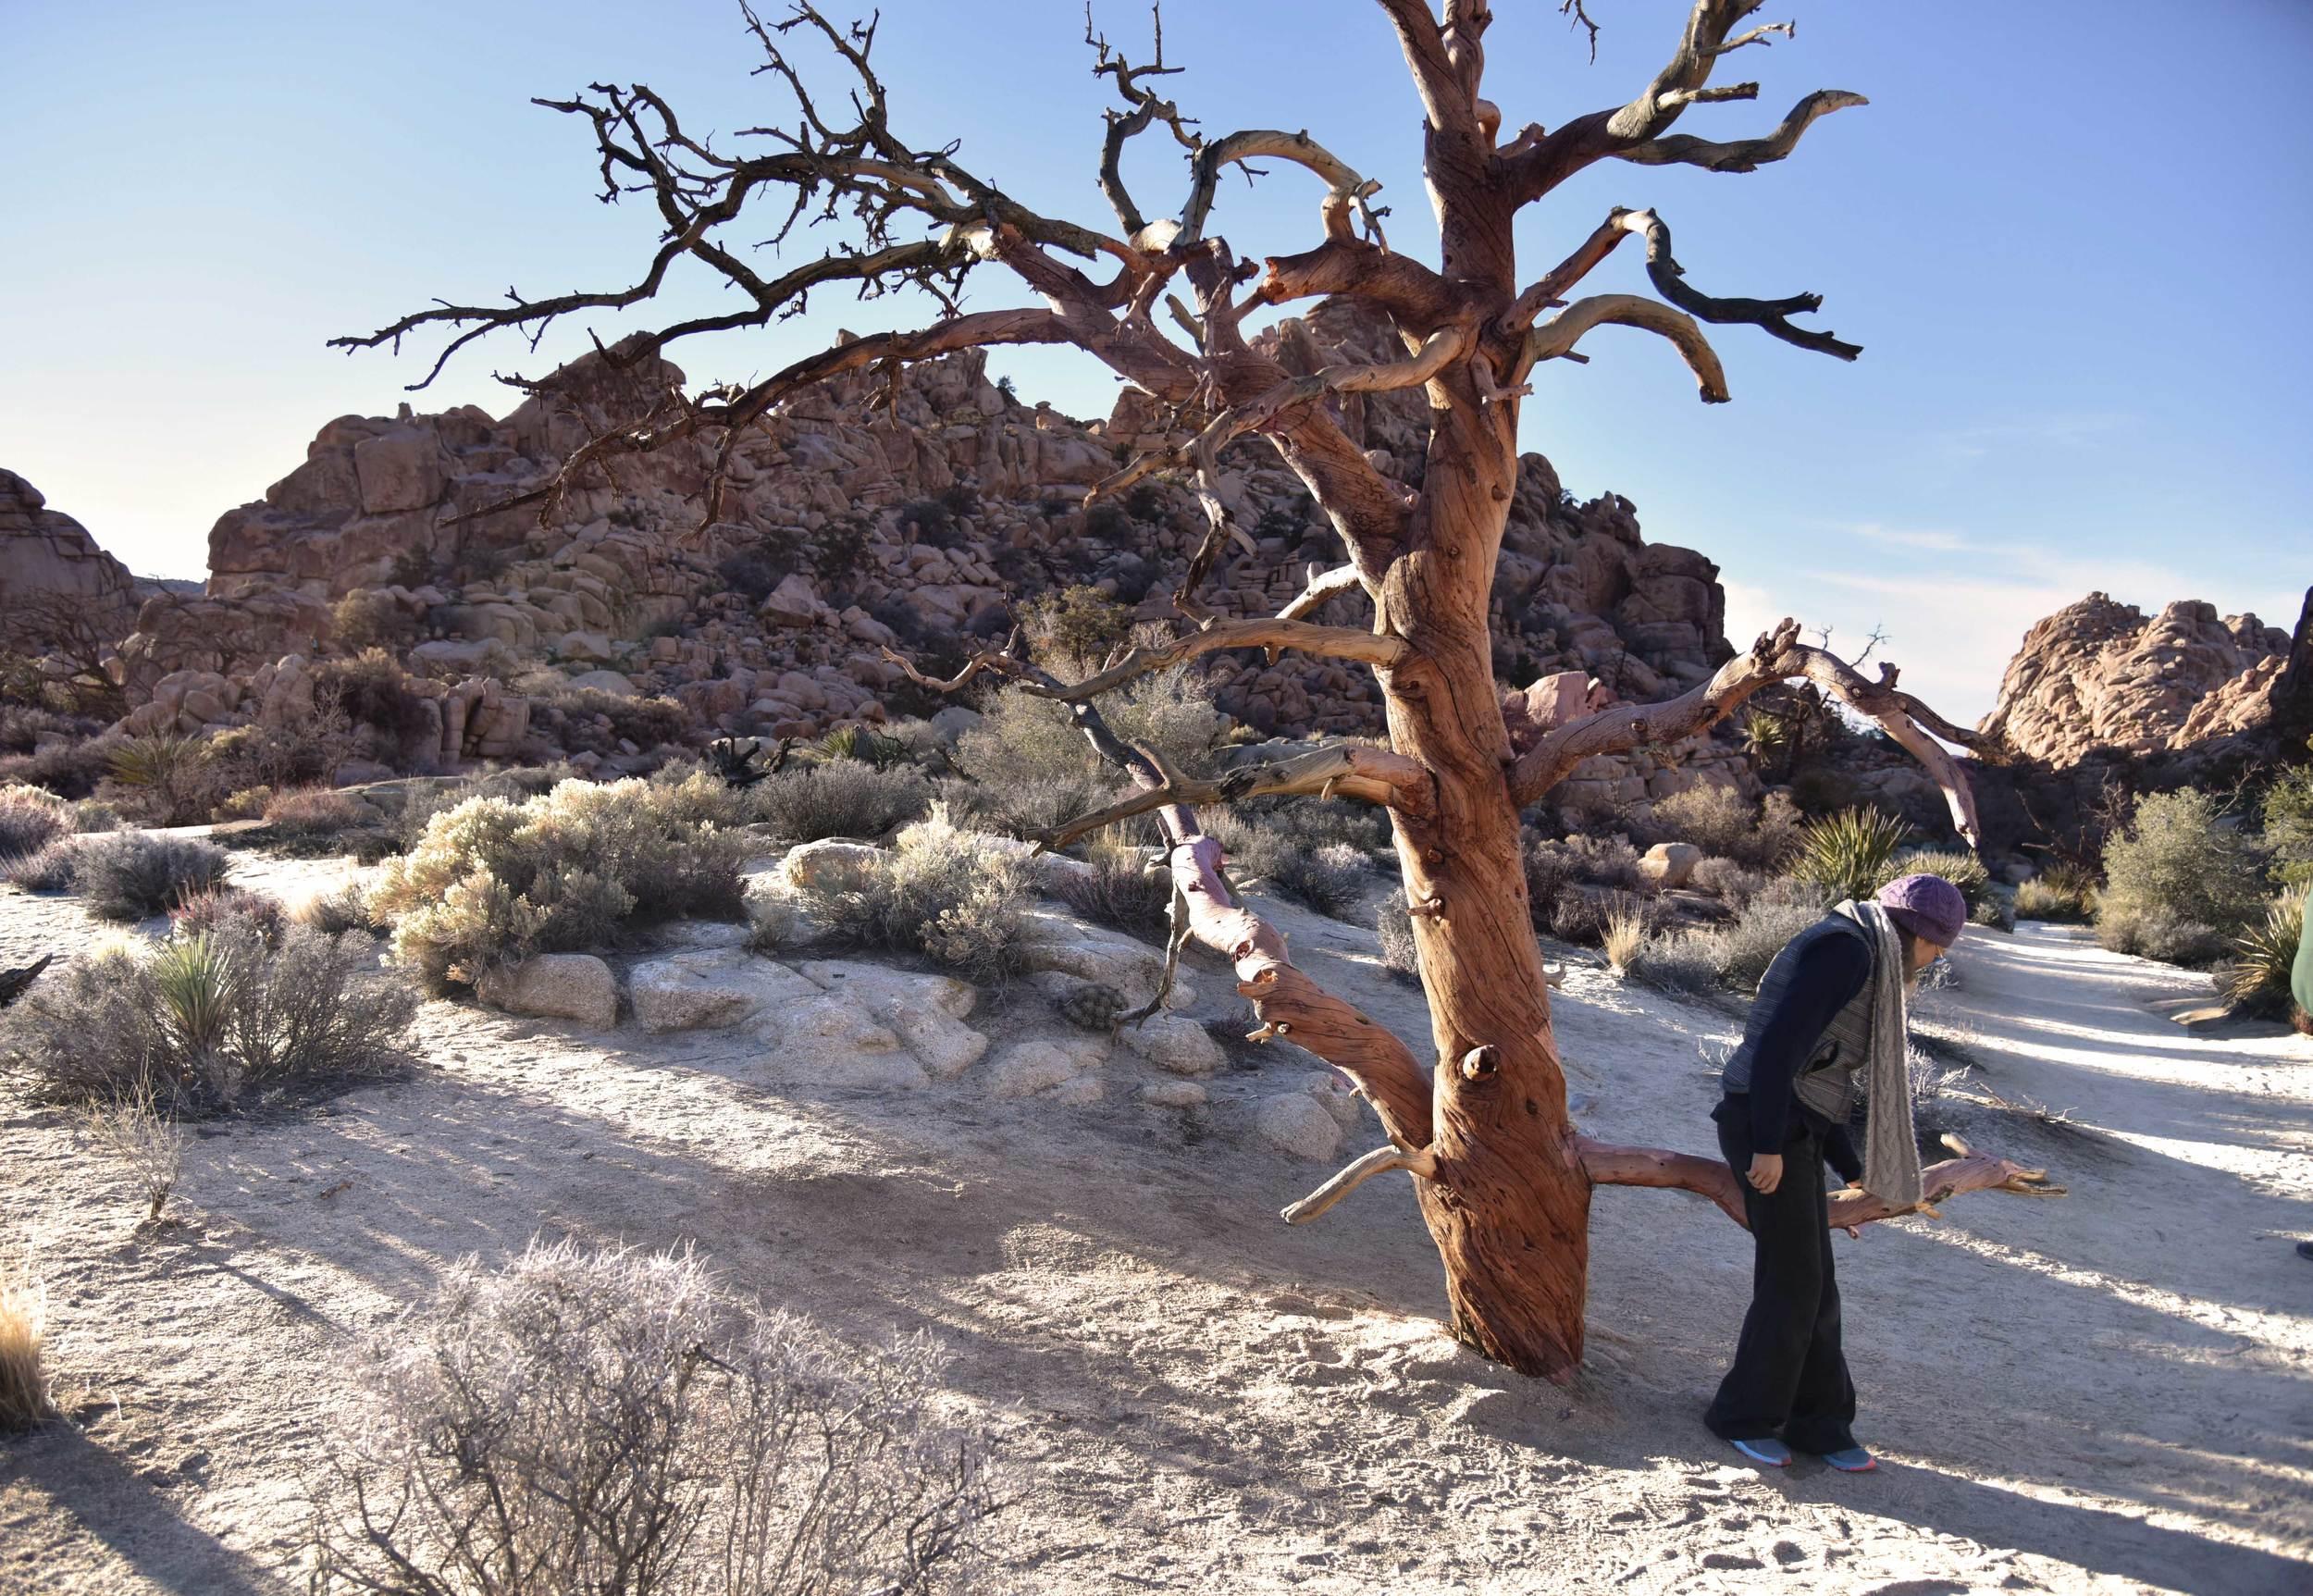 My friend Karol investigating a lone tree, Joshua Tree National Park, image©sourcingstyle.com